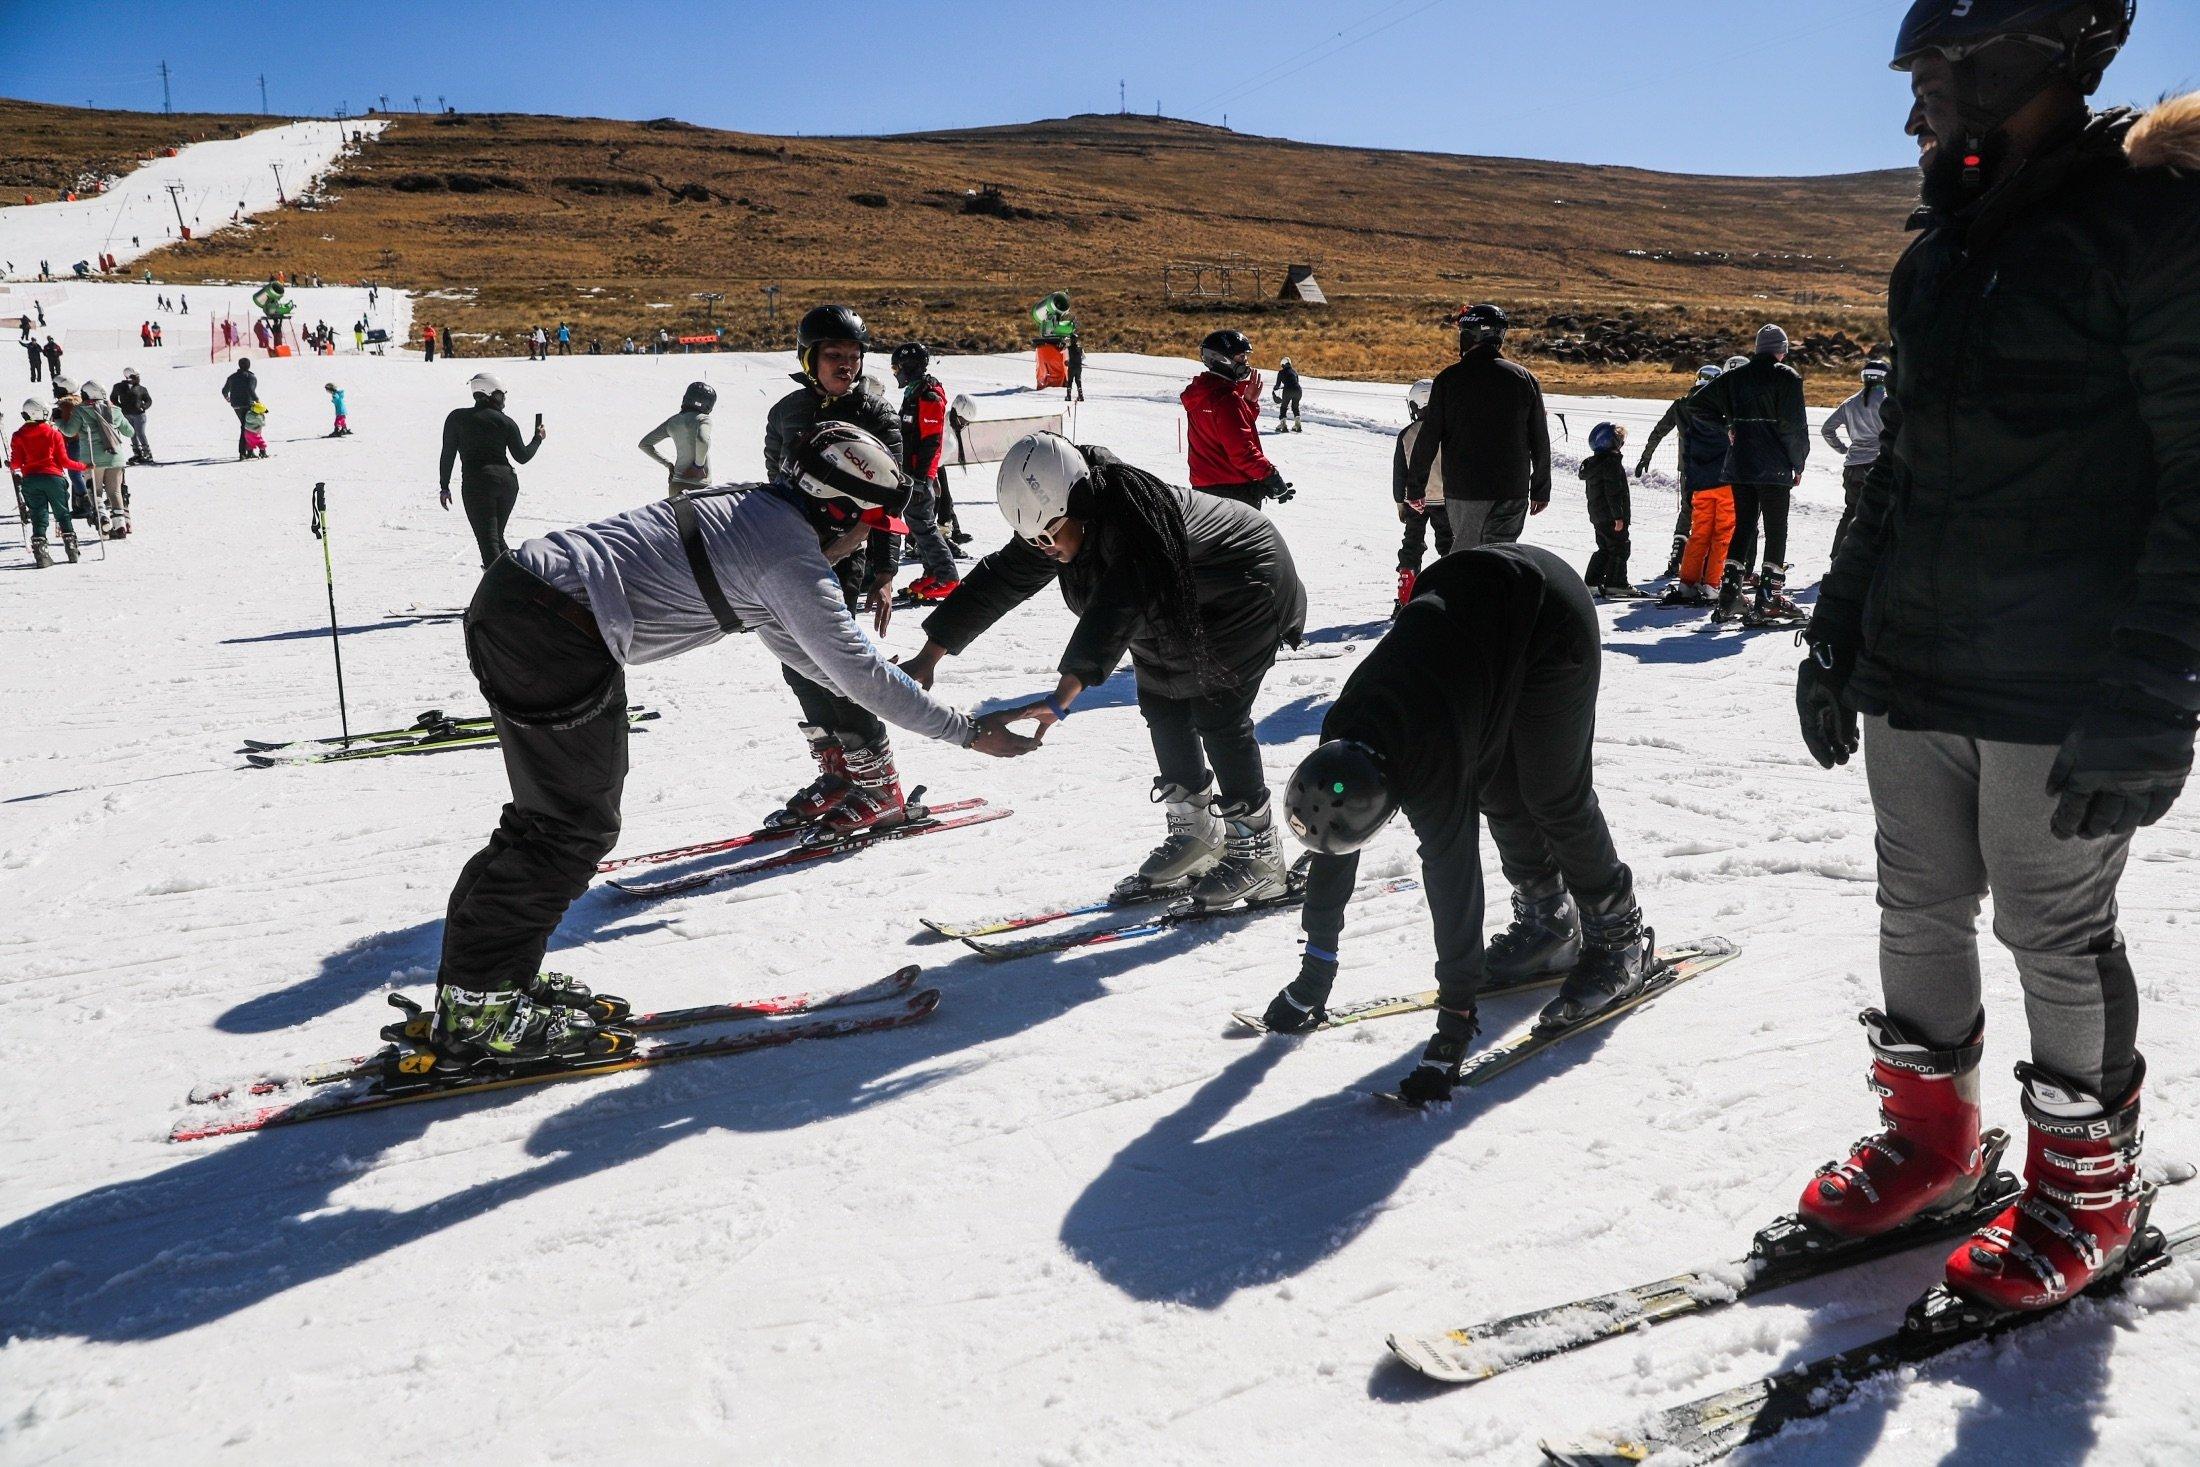 Hope Ramokotjo gives a ski lesson at Kapoko Snow Park at Afriski Mountain Resort in Butha Buthe, Lesotho, July 31, 2021. (Reuters Photo)